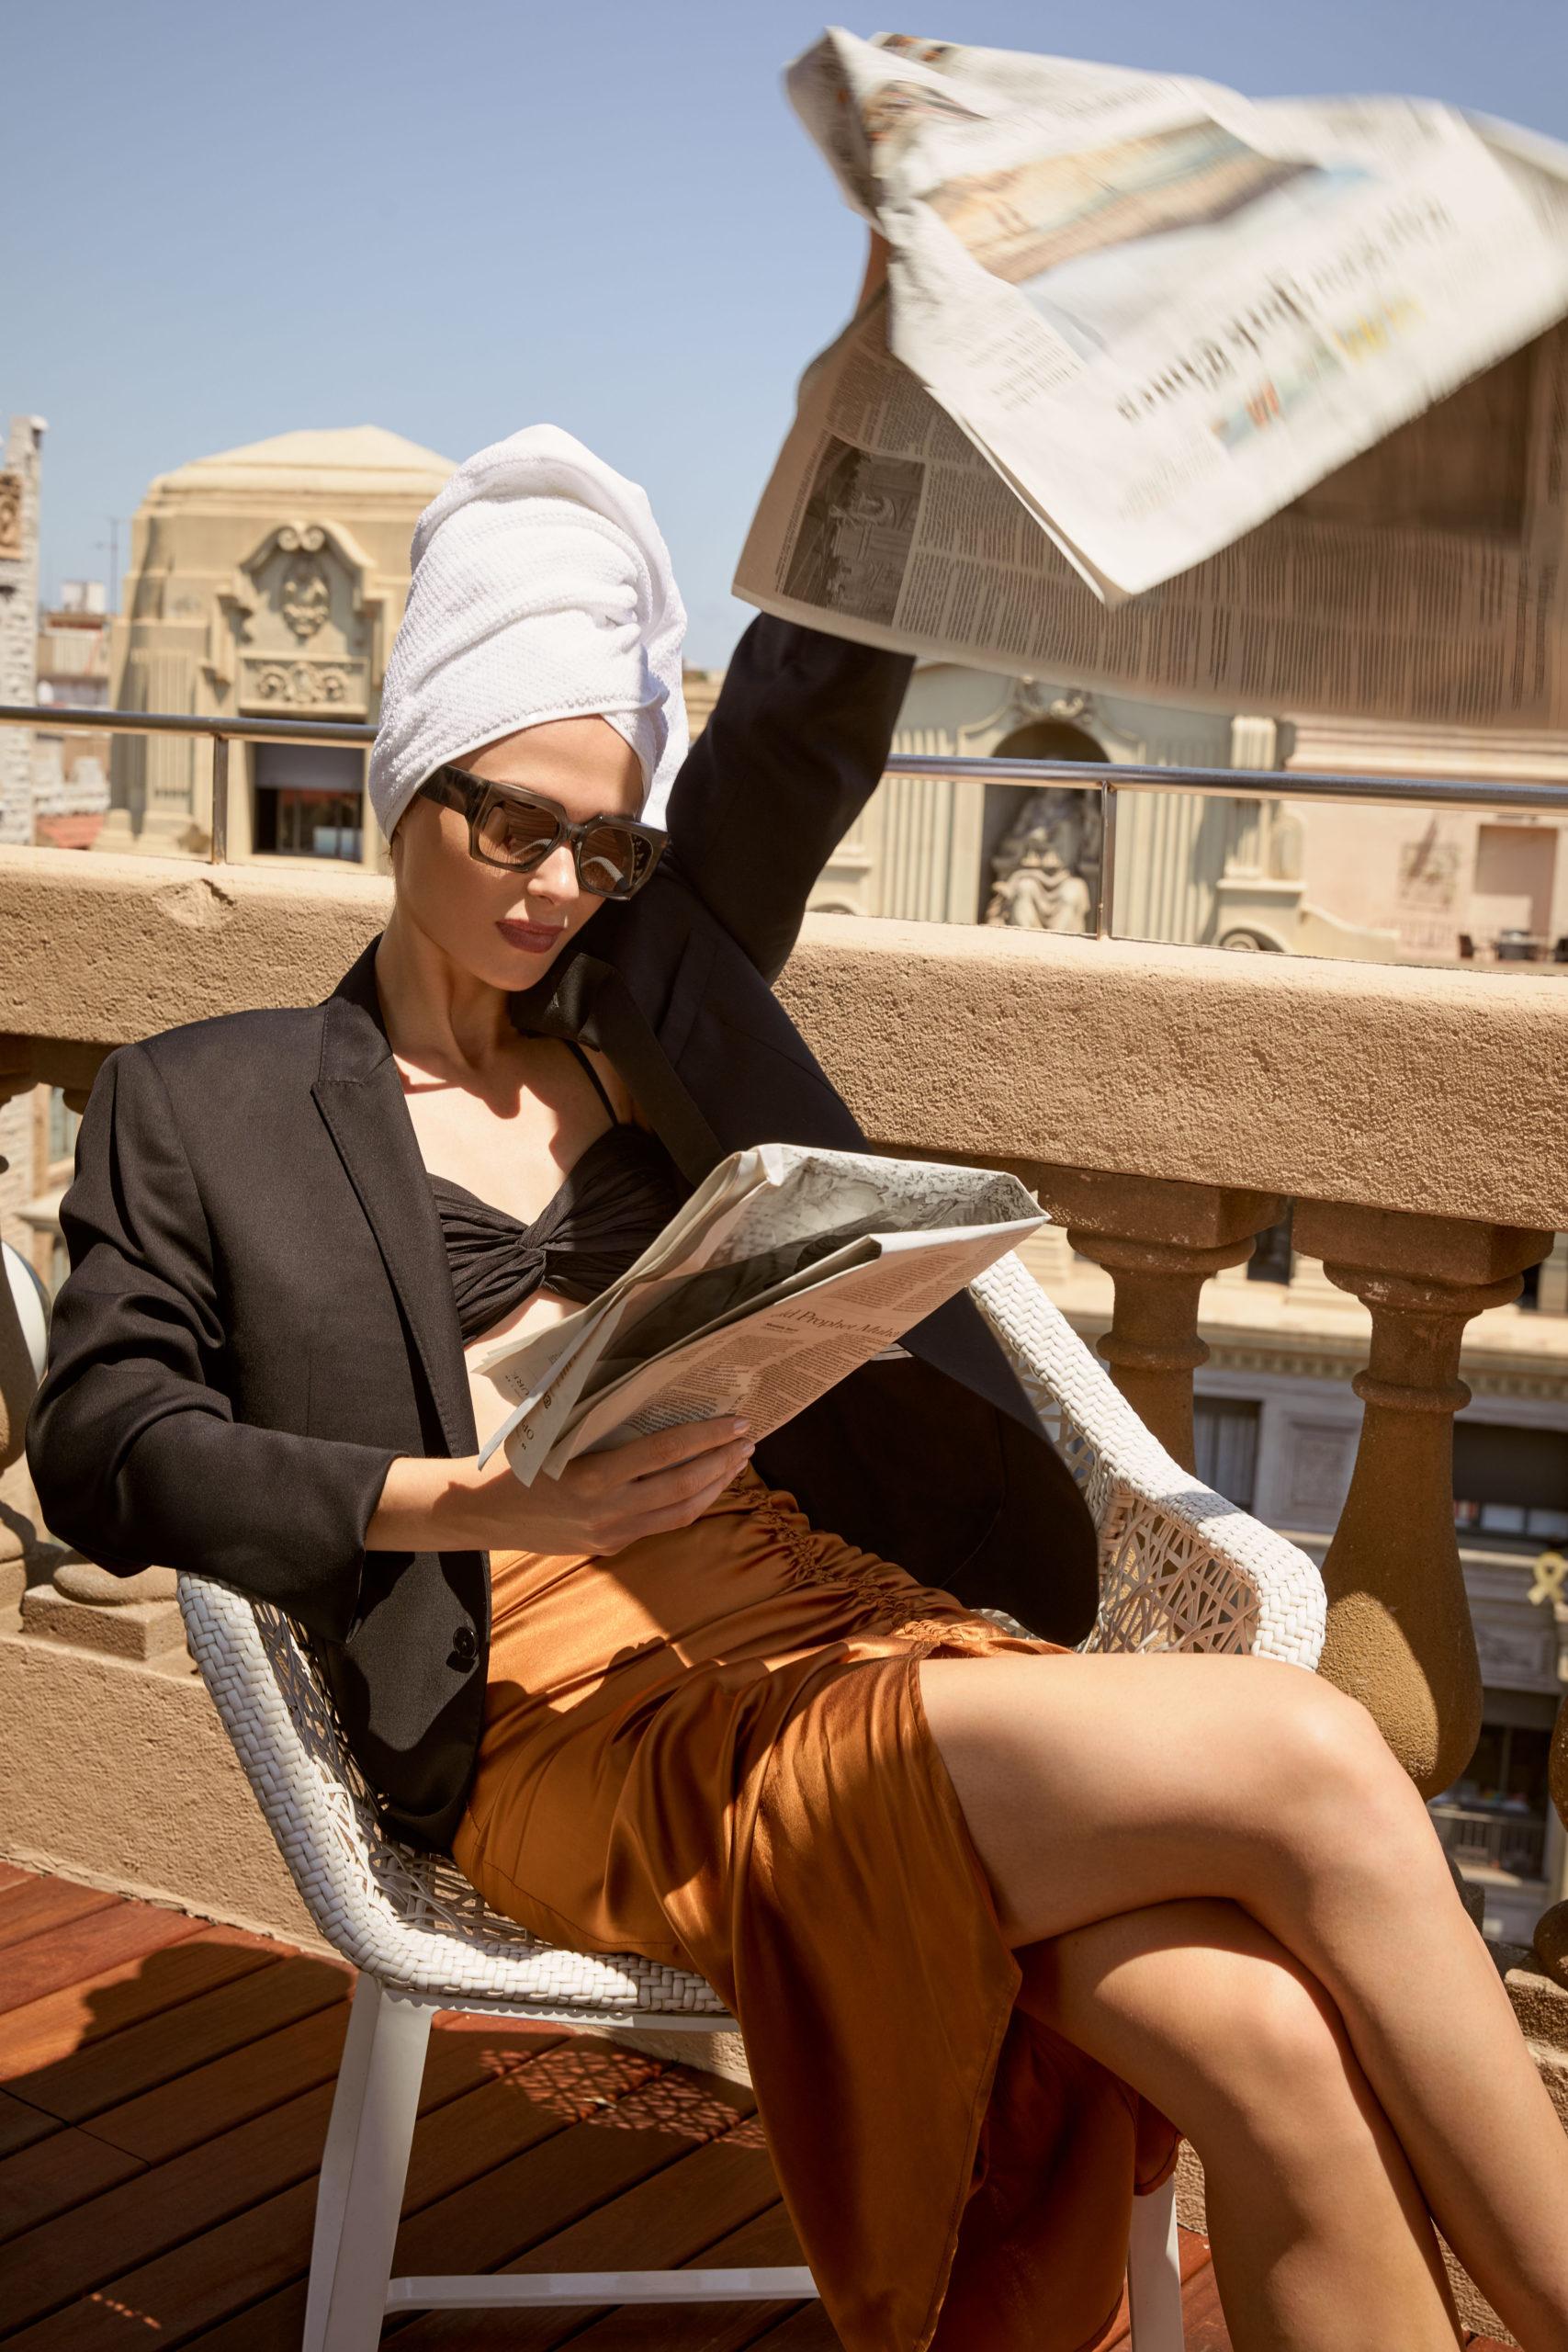 Revistas de moda, arte y viajes que inspiran a 8AM | 8 Artist Management